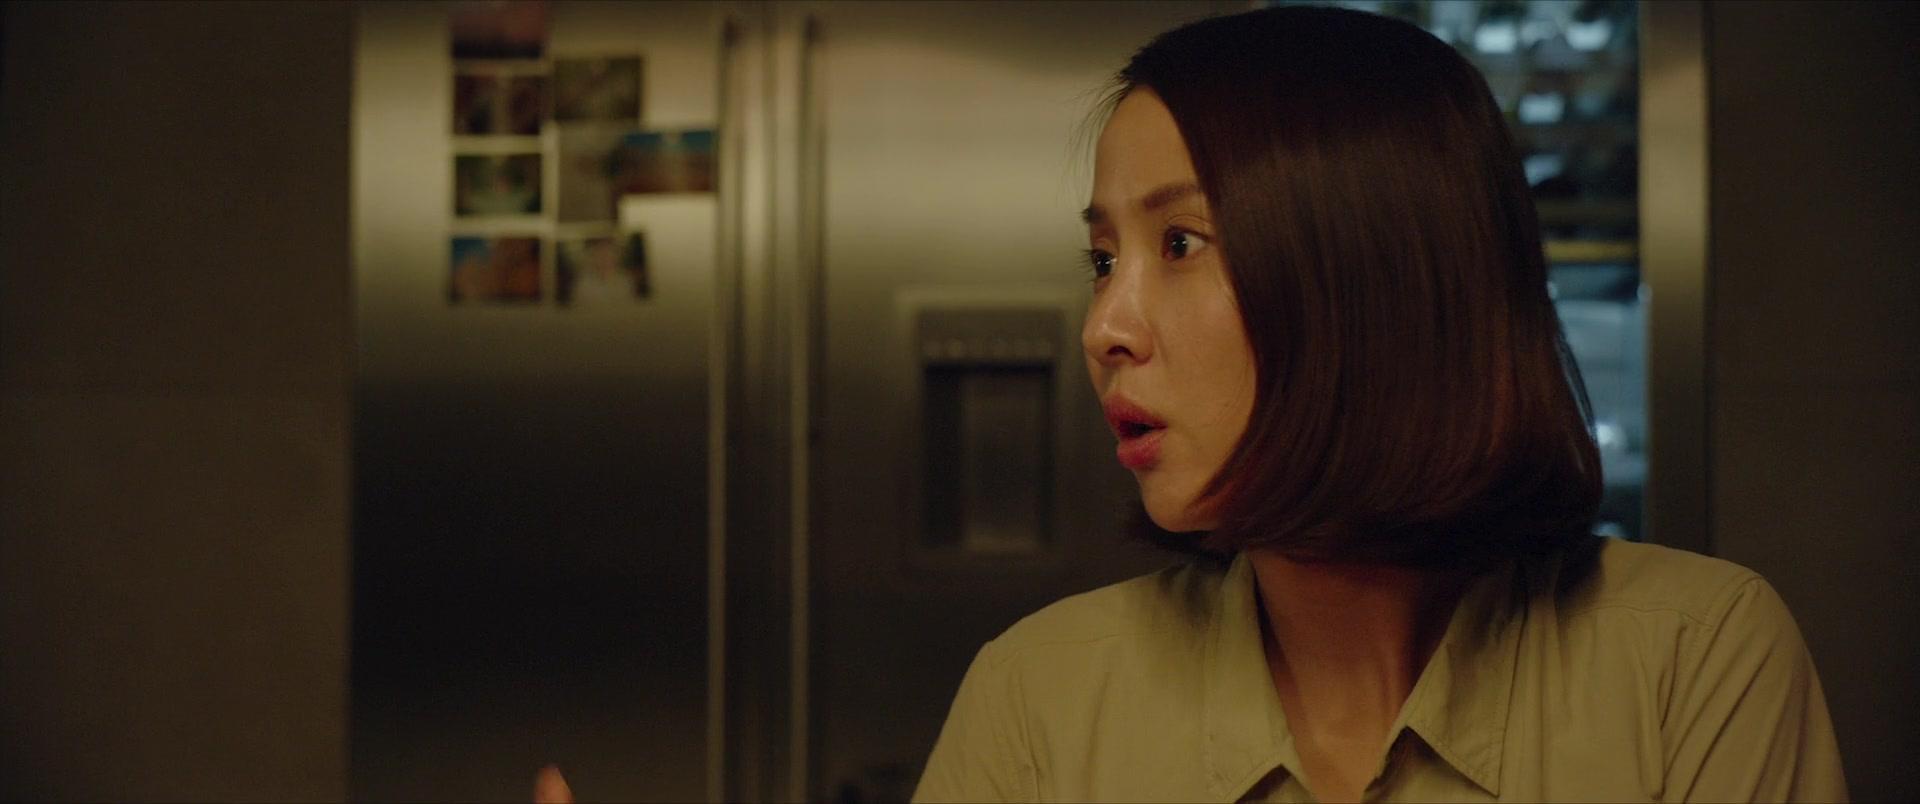 Parasite (2019) 1080p BluRay x264 [Dual Audio][Hindi+Korean] - Exclusive